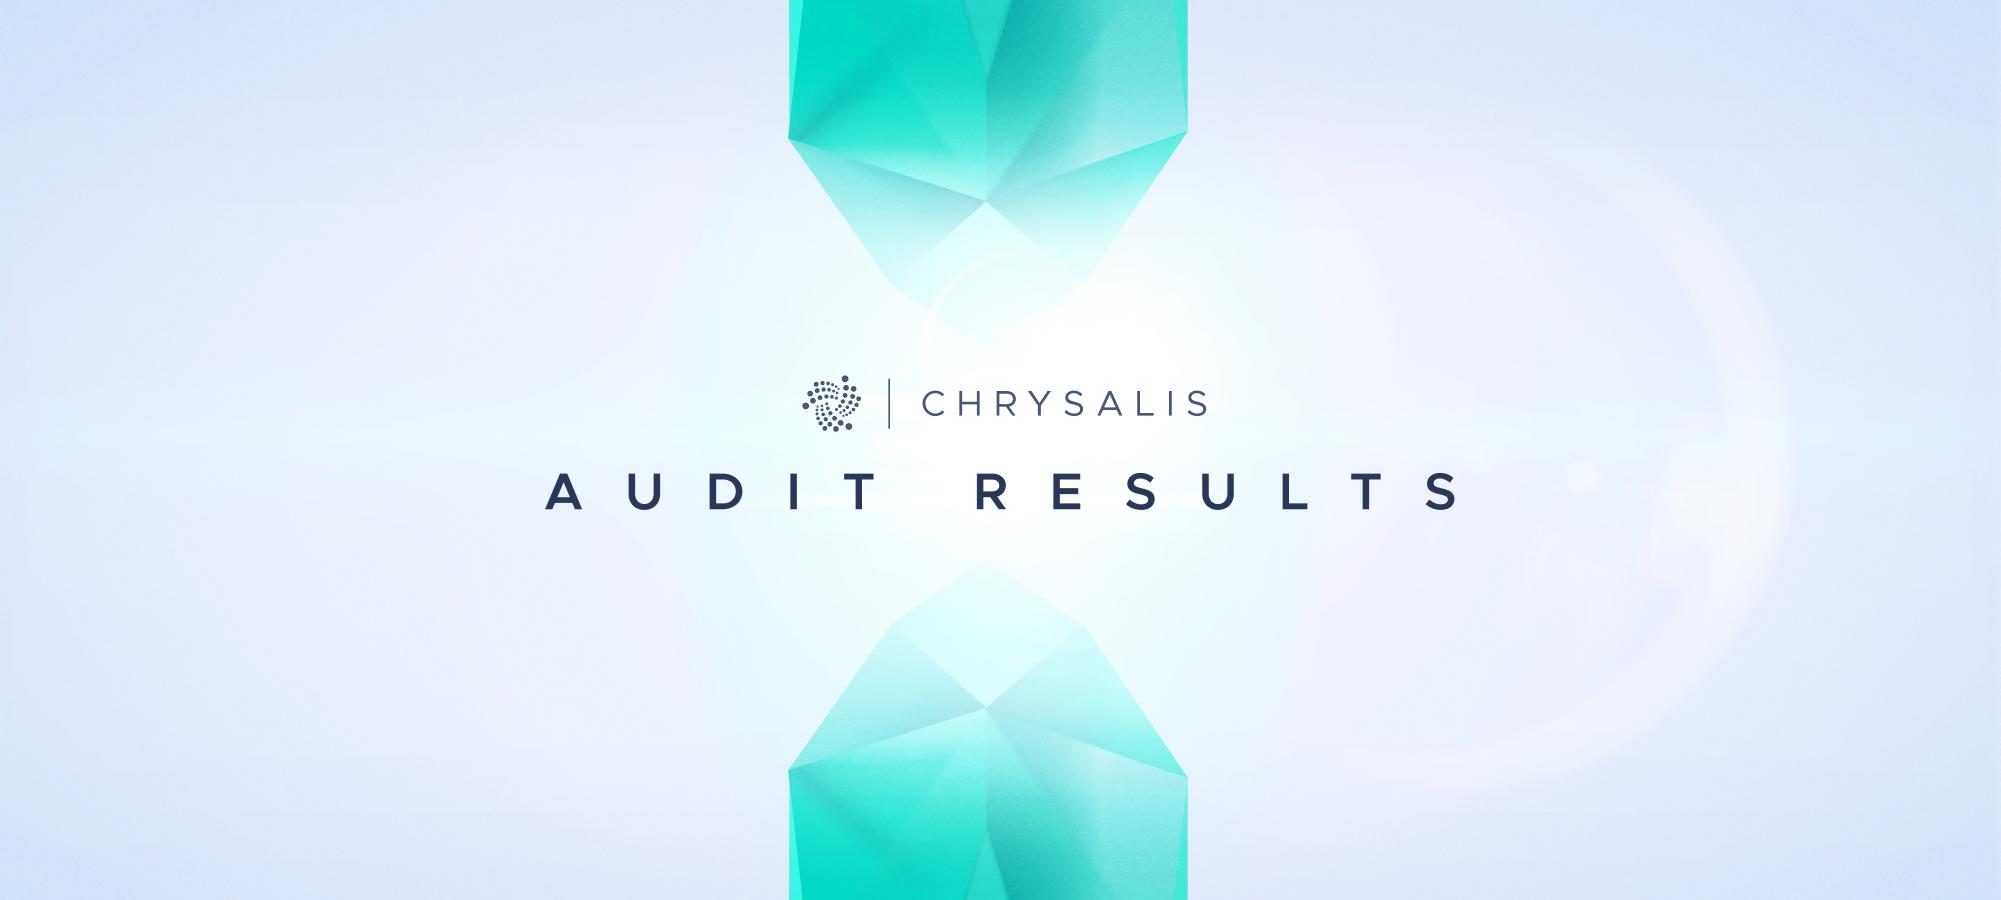 Chrysalis - Audit Results